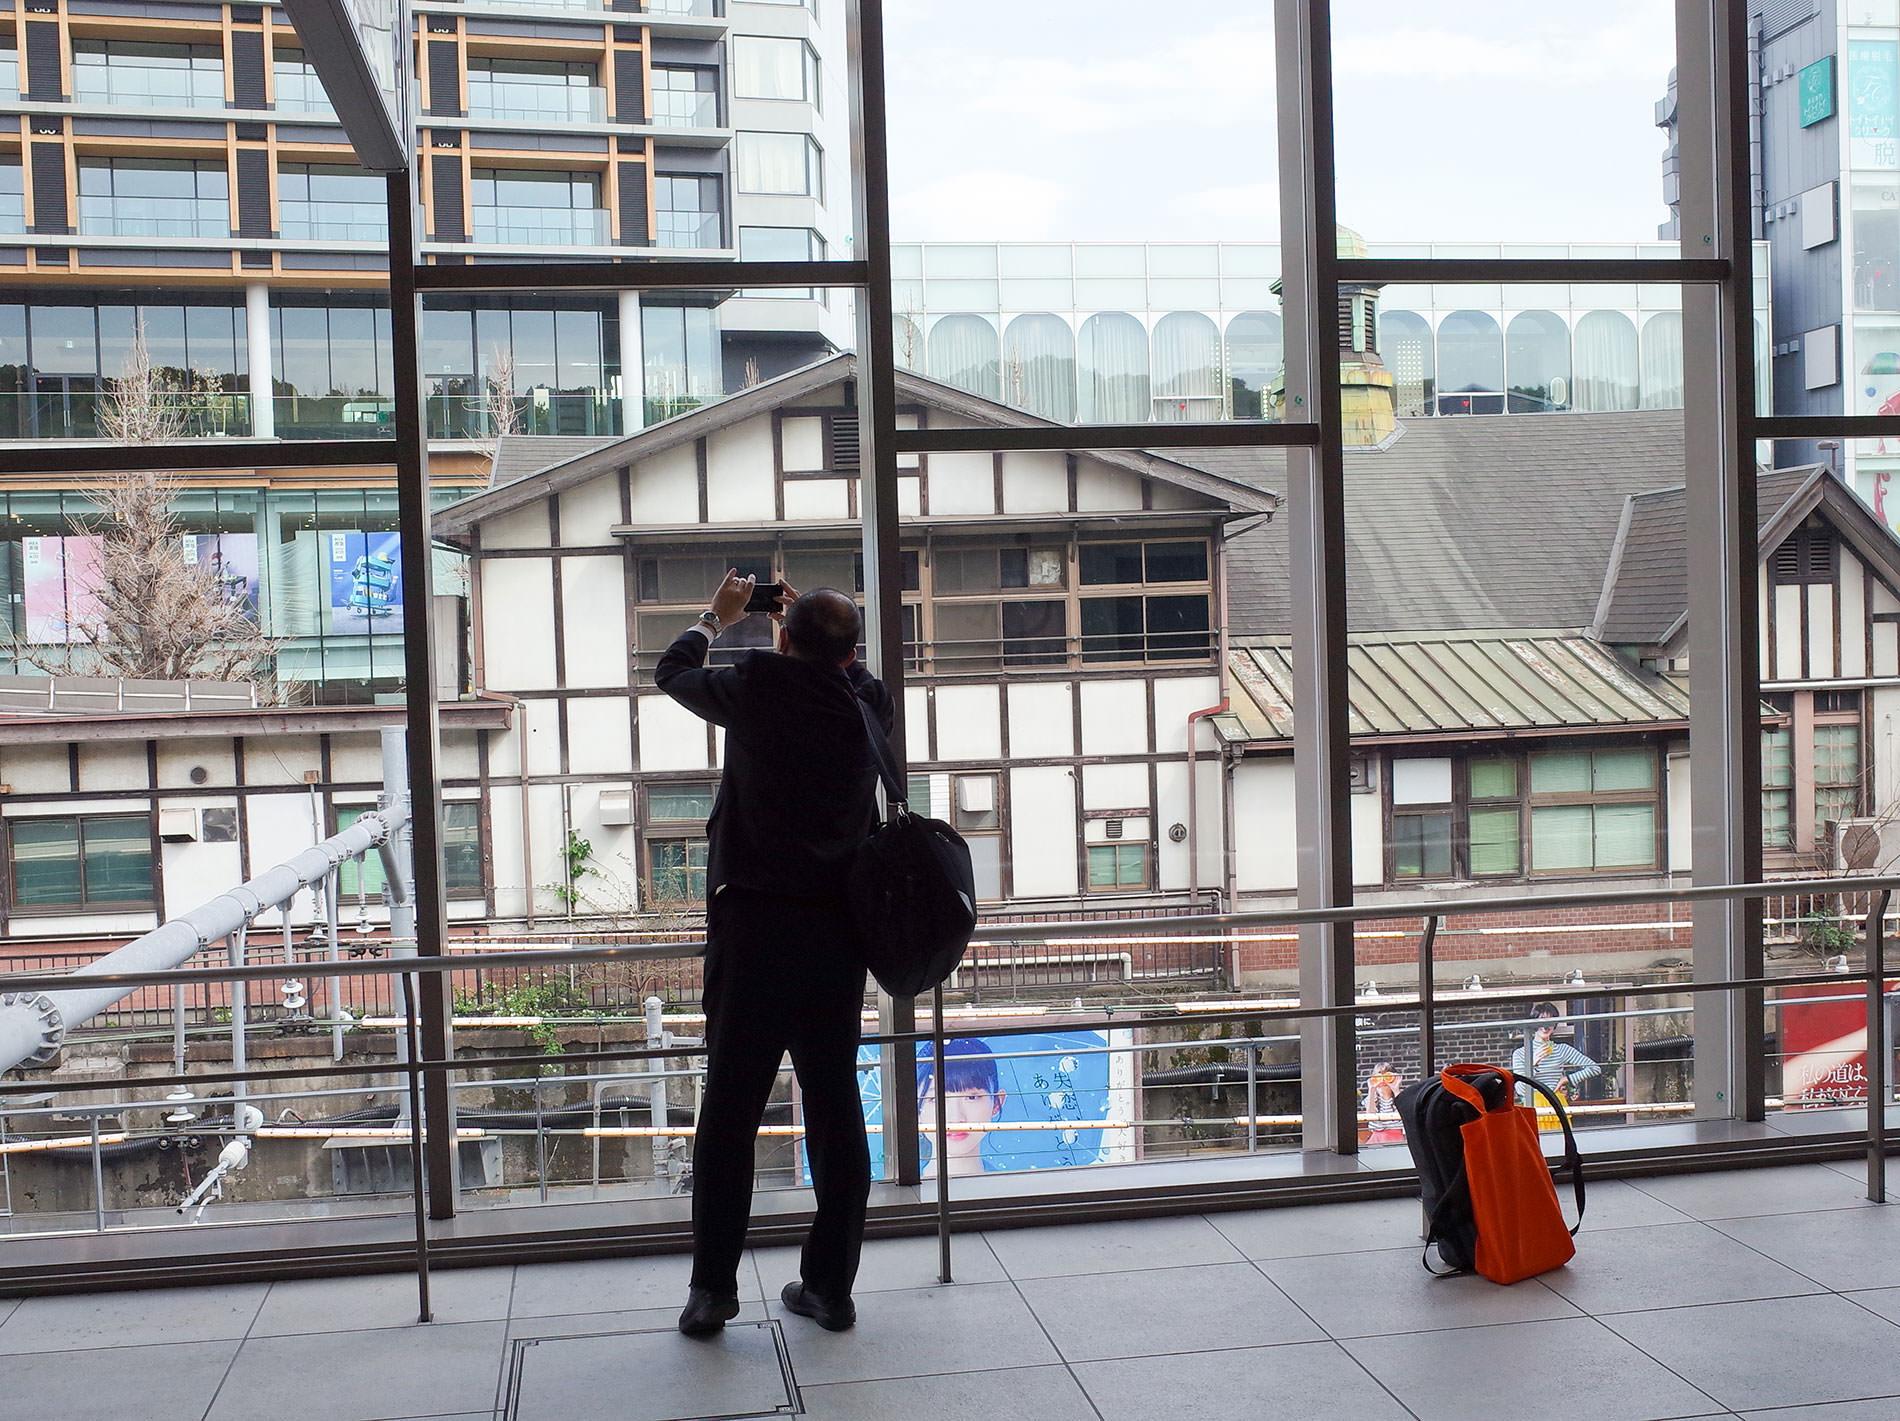 JR原宿駅 新駅舎 / jr_harajyuku_station_new_station_building